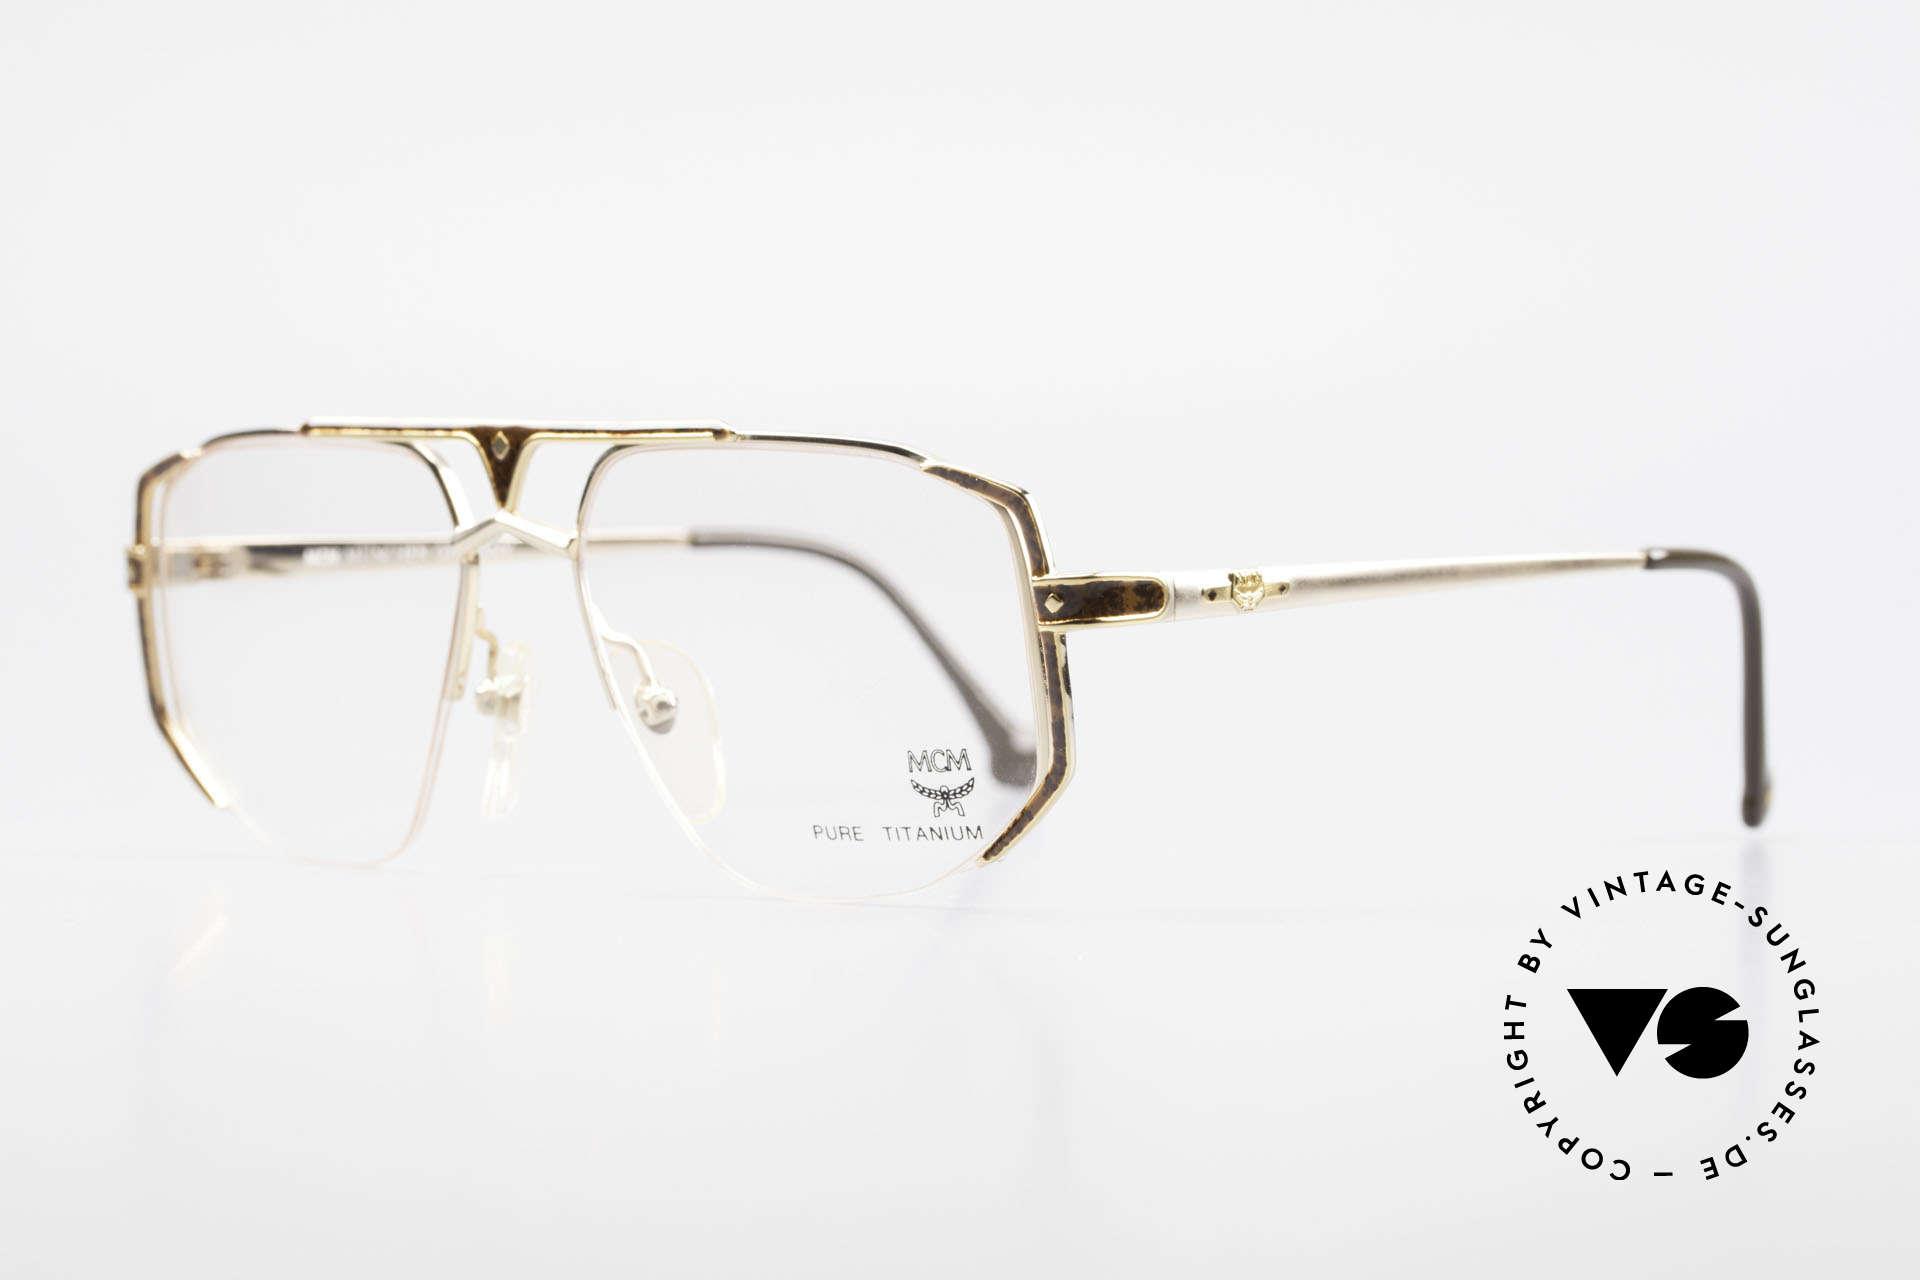 MCM München 5 Titanium Glasses Gold Plated, luxury eyeglasses by Michael Cromer (MC), Munich (M), Made for Men